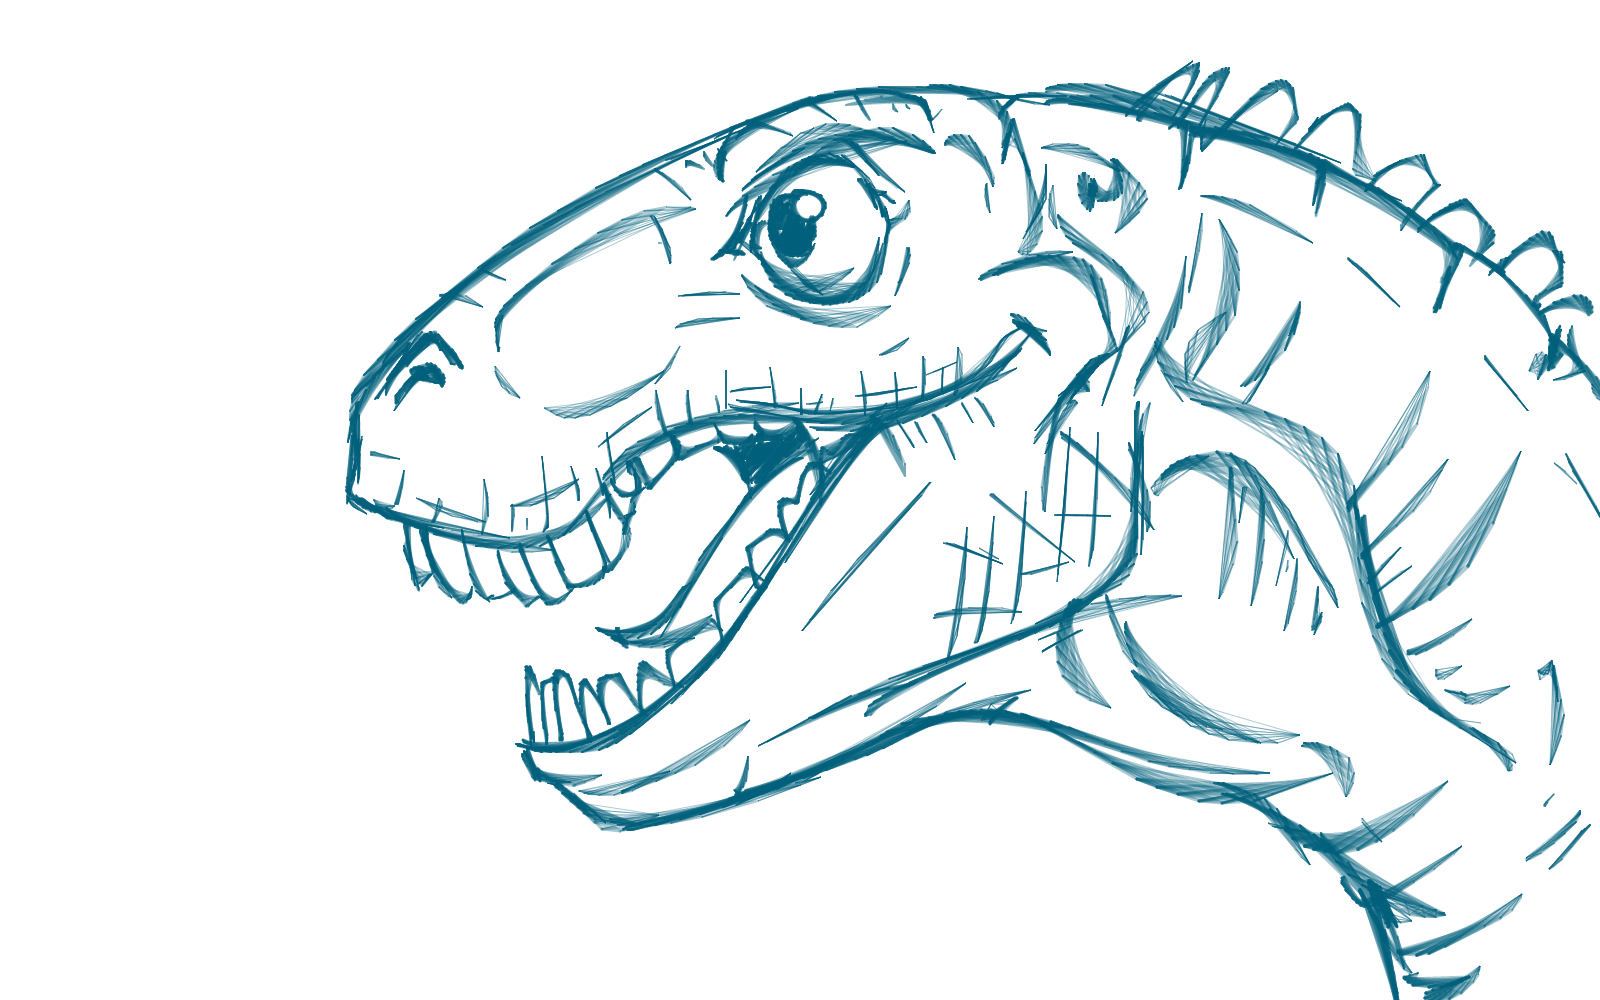 Dino Head 4 by stroggtank